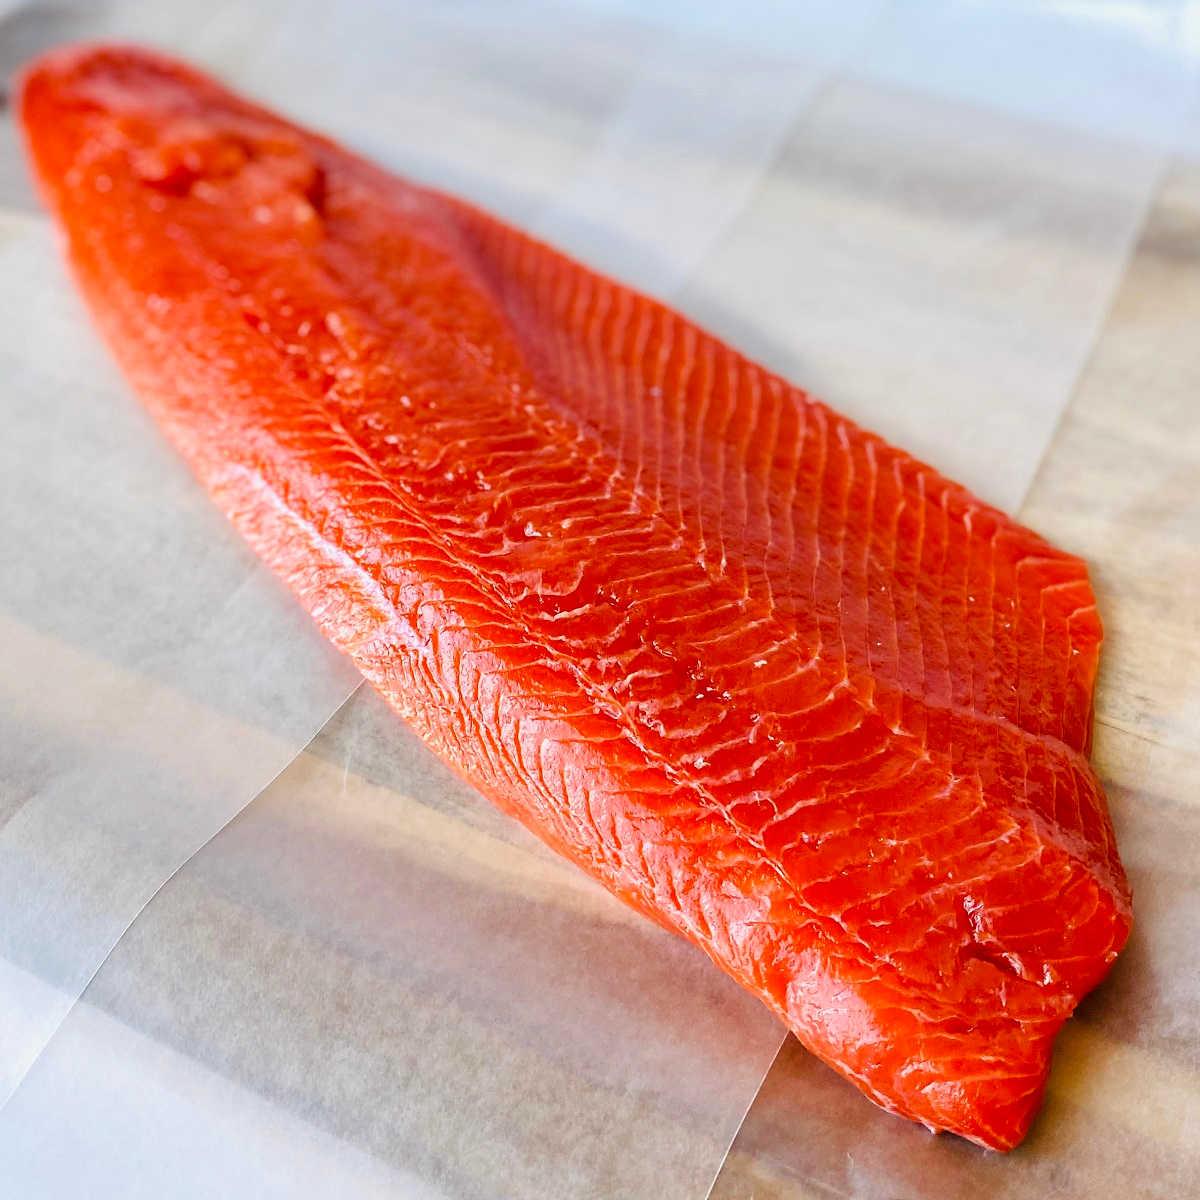 wild caught alaskan sockeye salmon filet